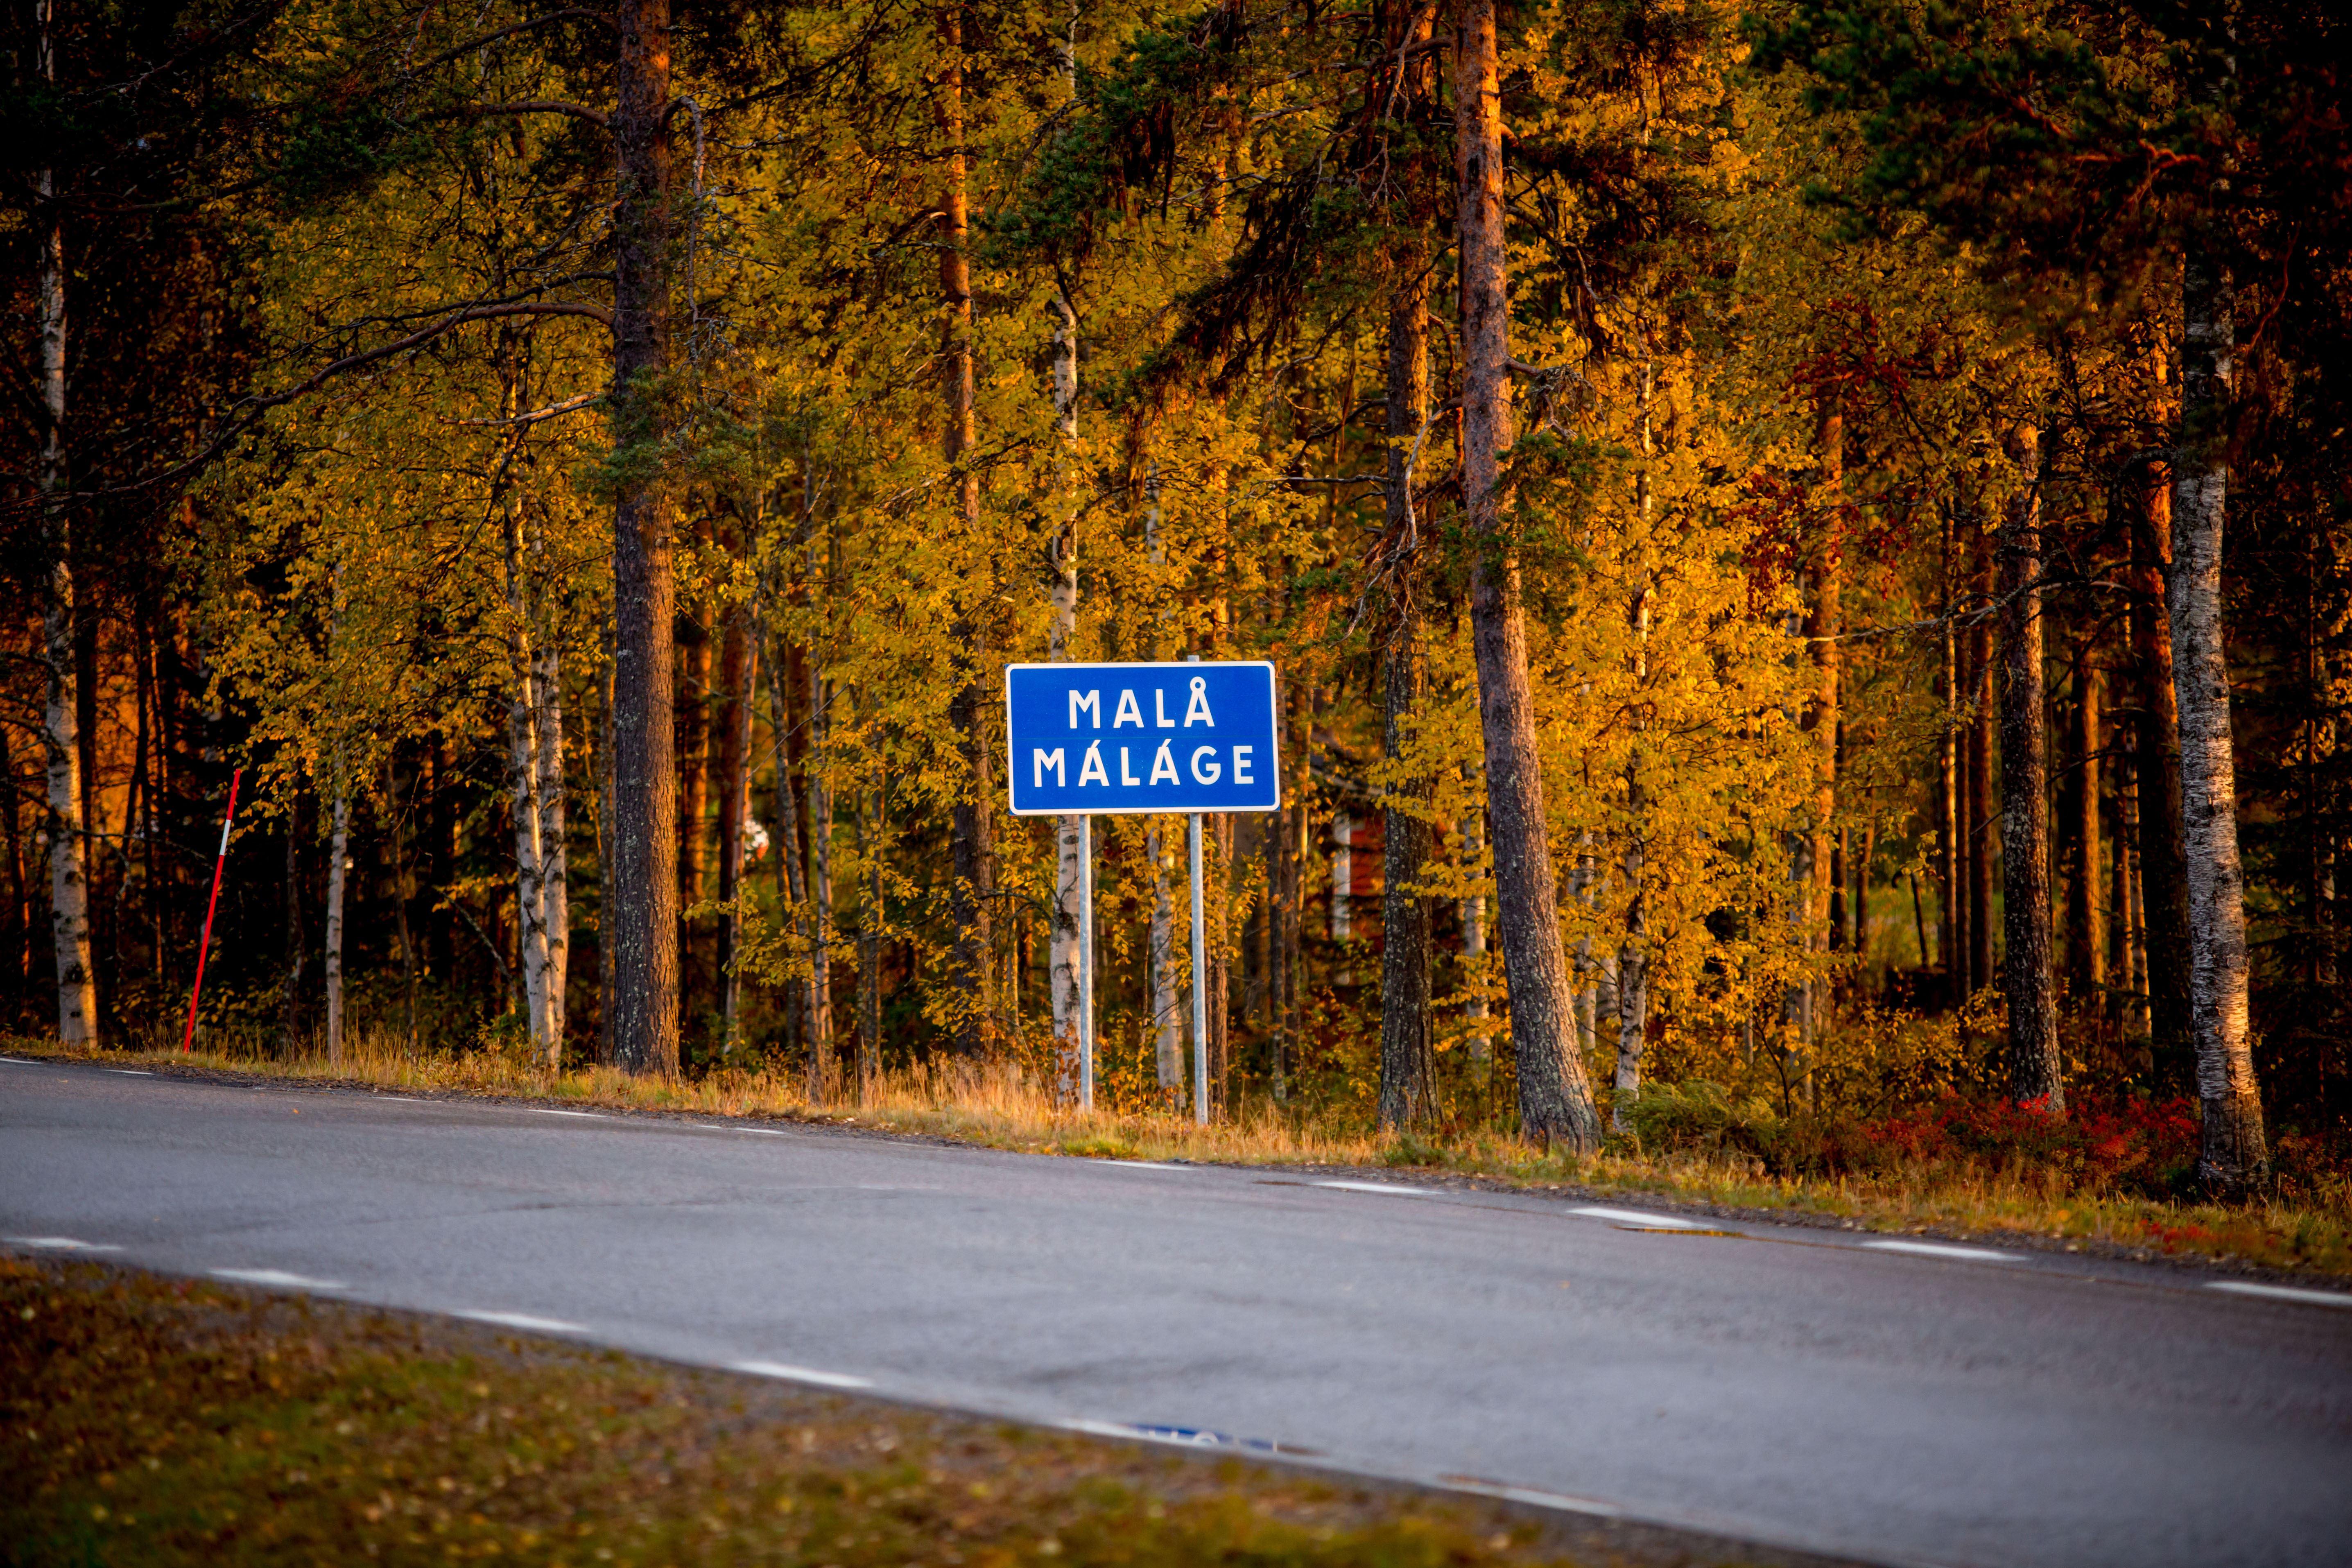 www.ricke.se,  © Malå kommun, Genomgång ortsnamn - Olavi Korhonen